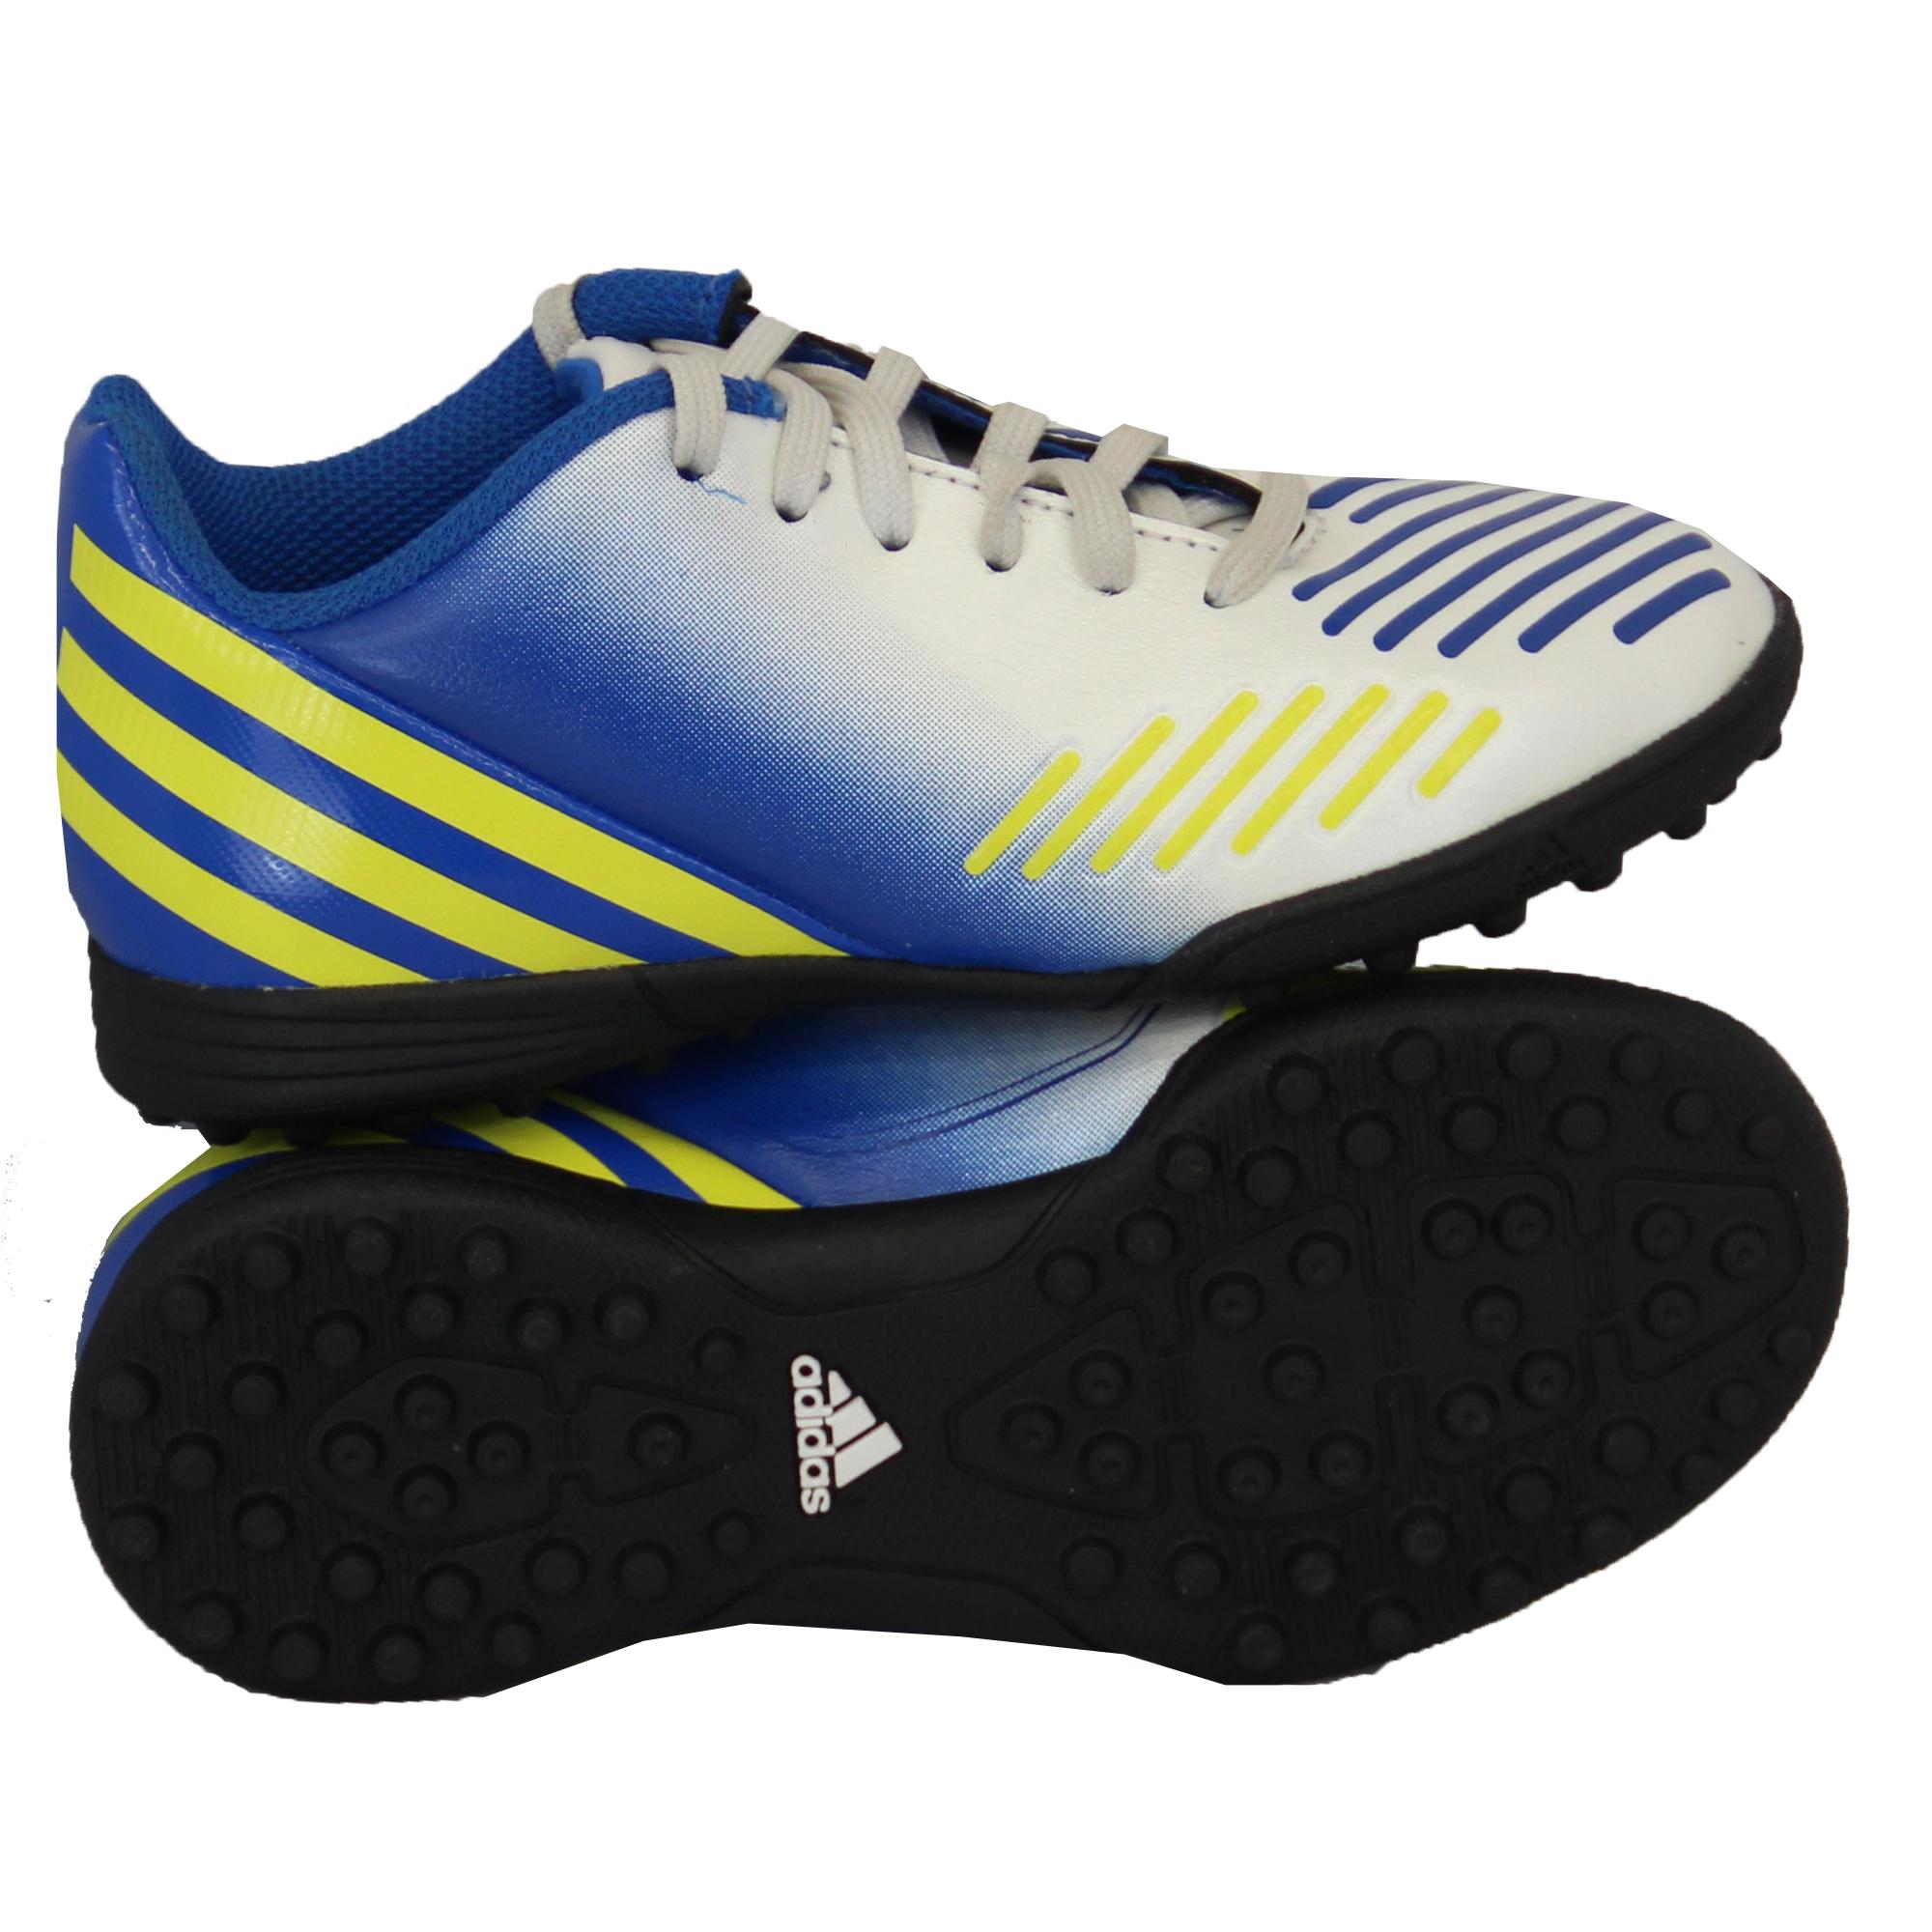 Adidas Turf Soccer Shoes Amazon